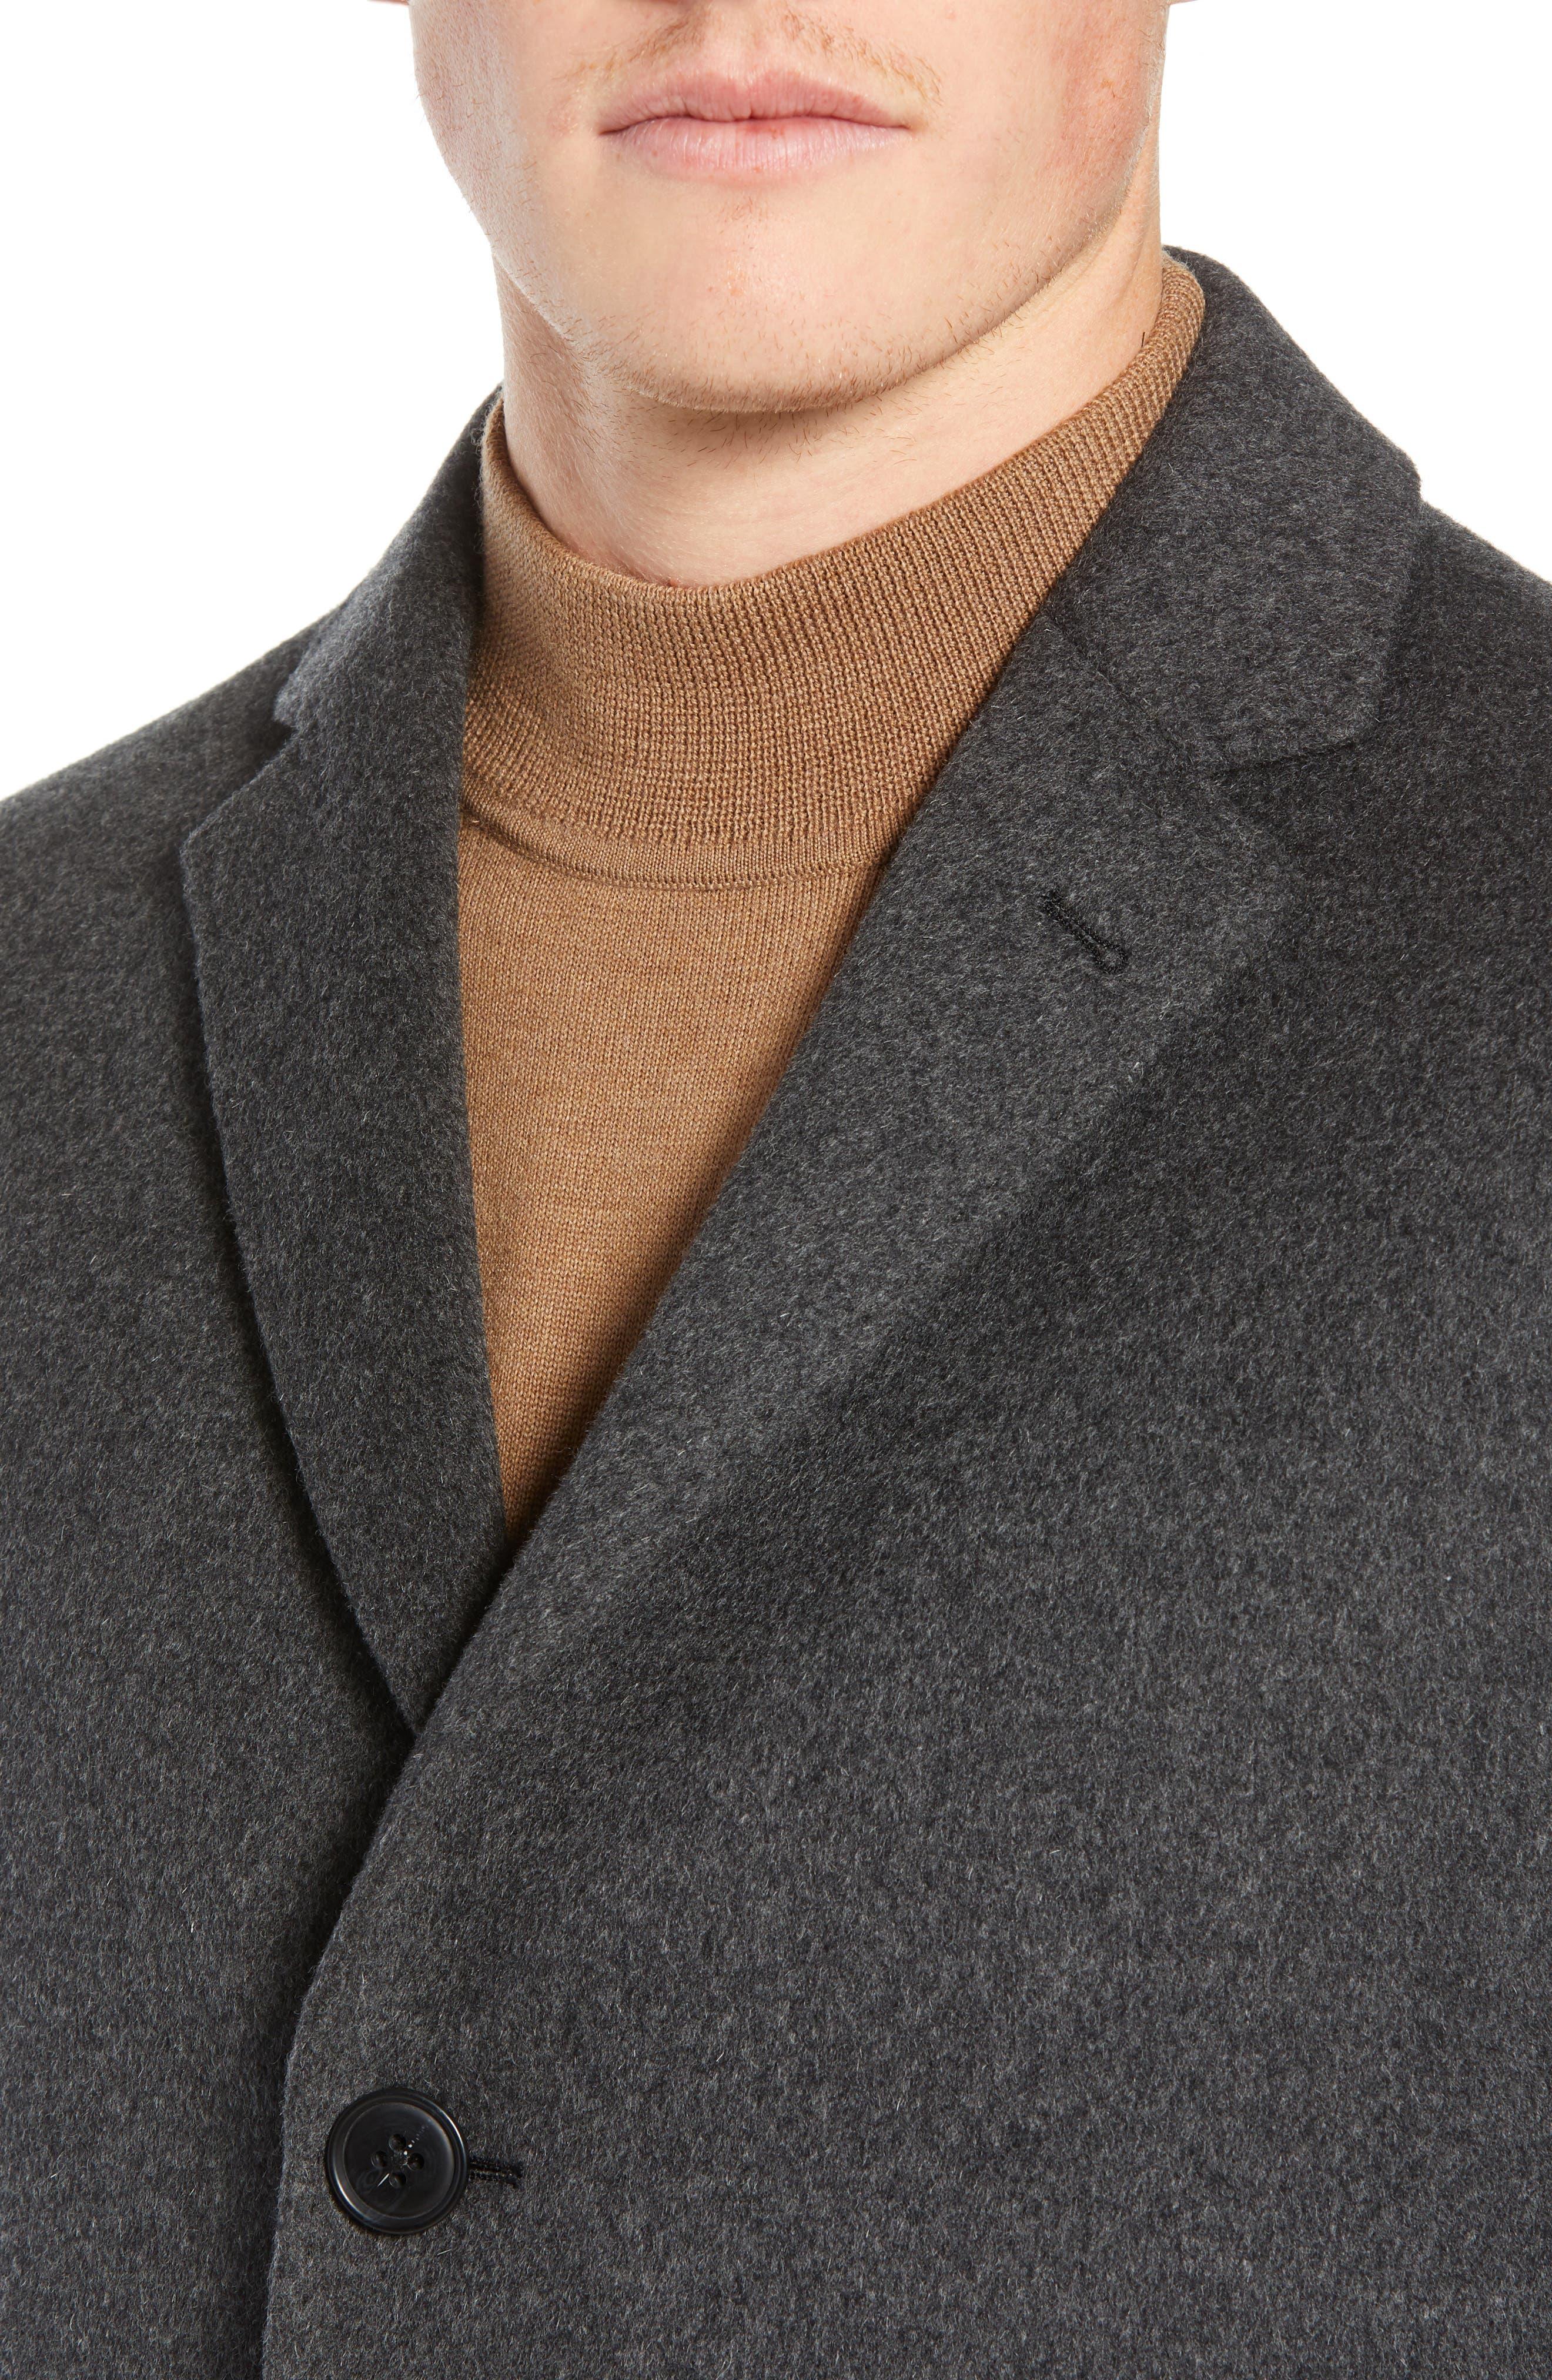 Mason Wool & Cashmere Overcoat,                             Alternate thumbnail 4, color,                             CHARCOAL